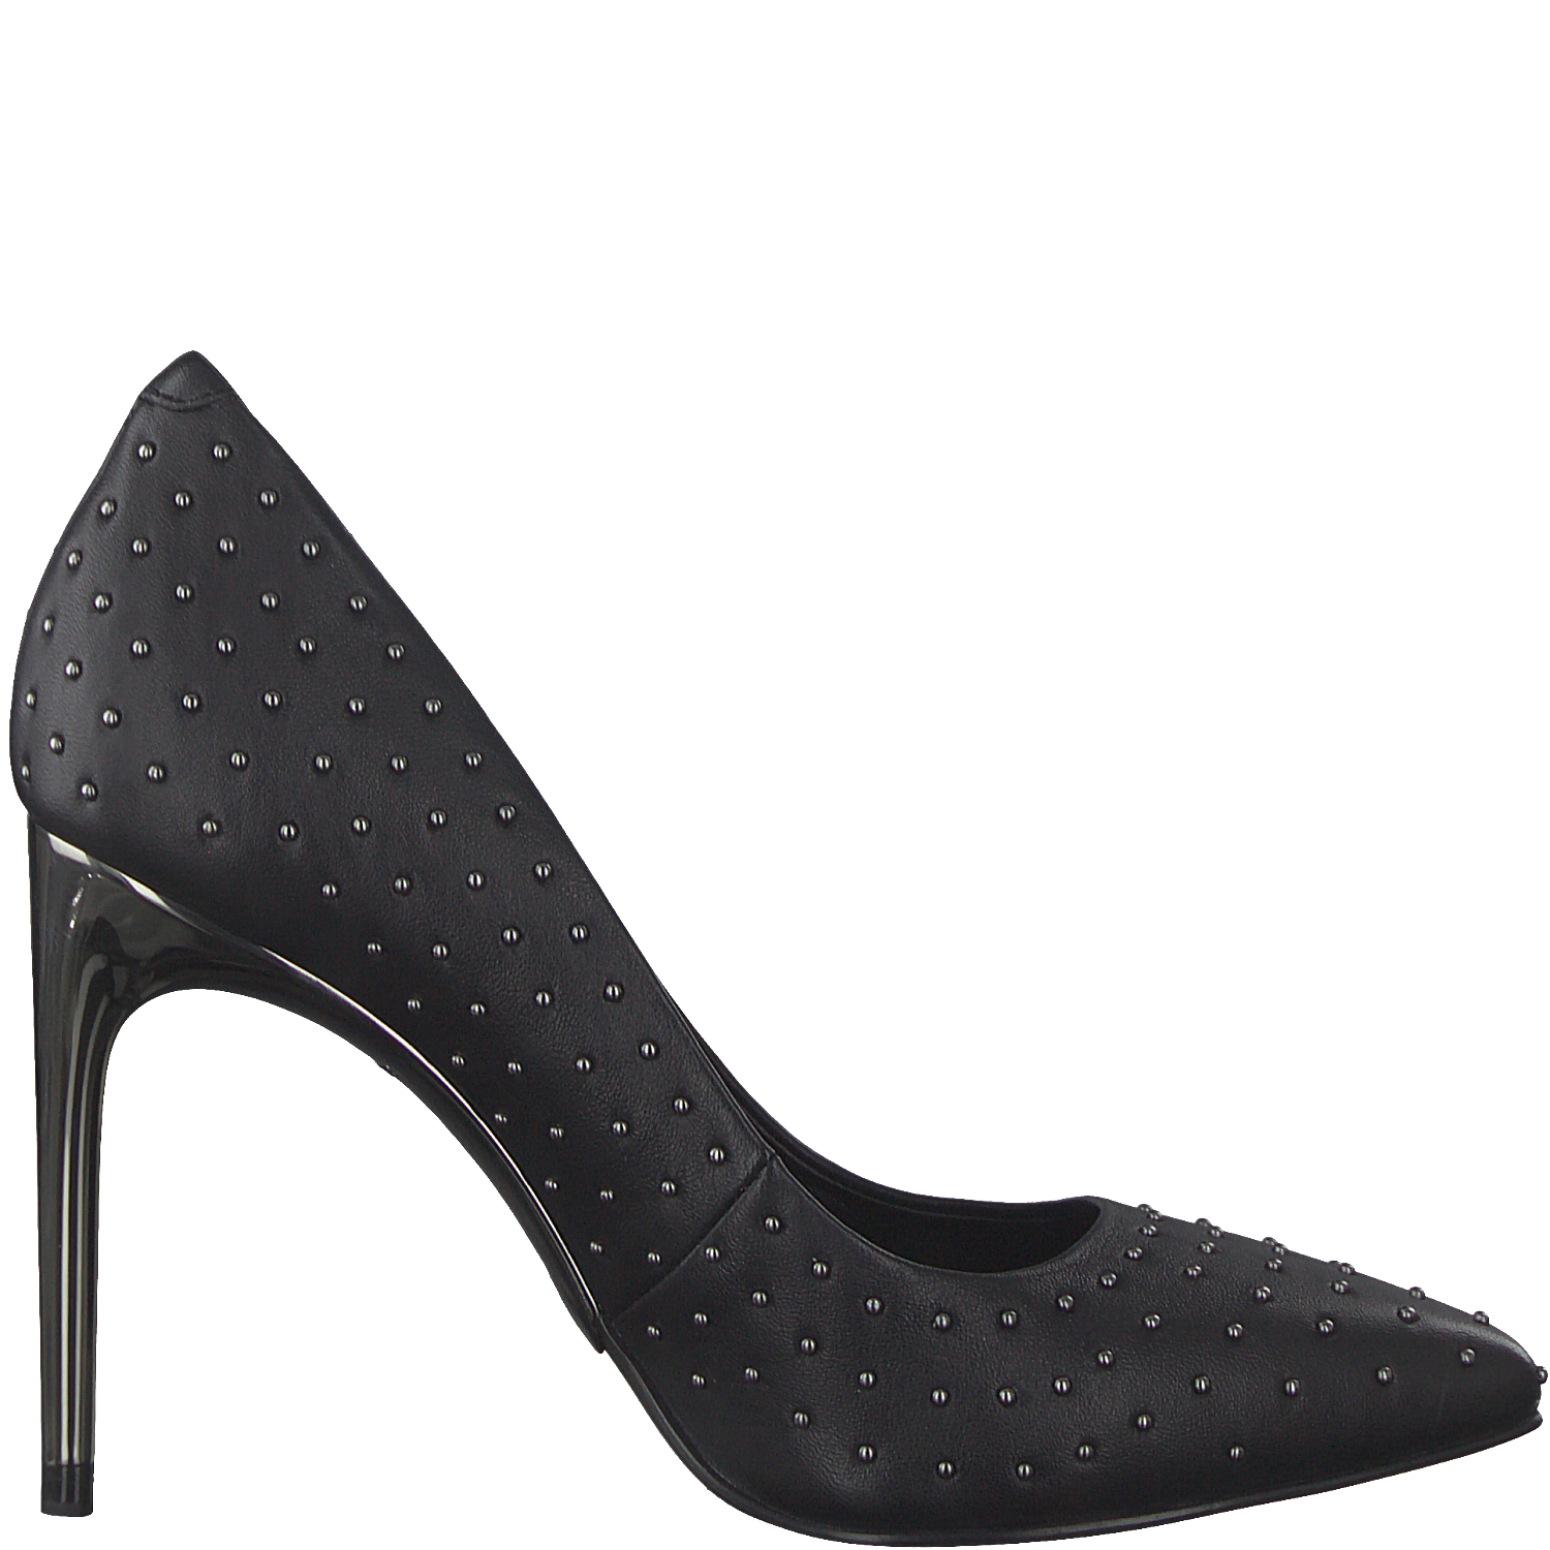 Details zu Tamaris 1 22438 23 Damen Schuhe Pumps High Heel Stiletto